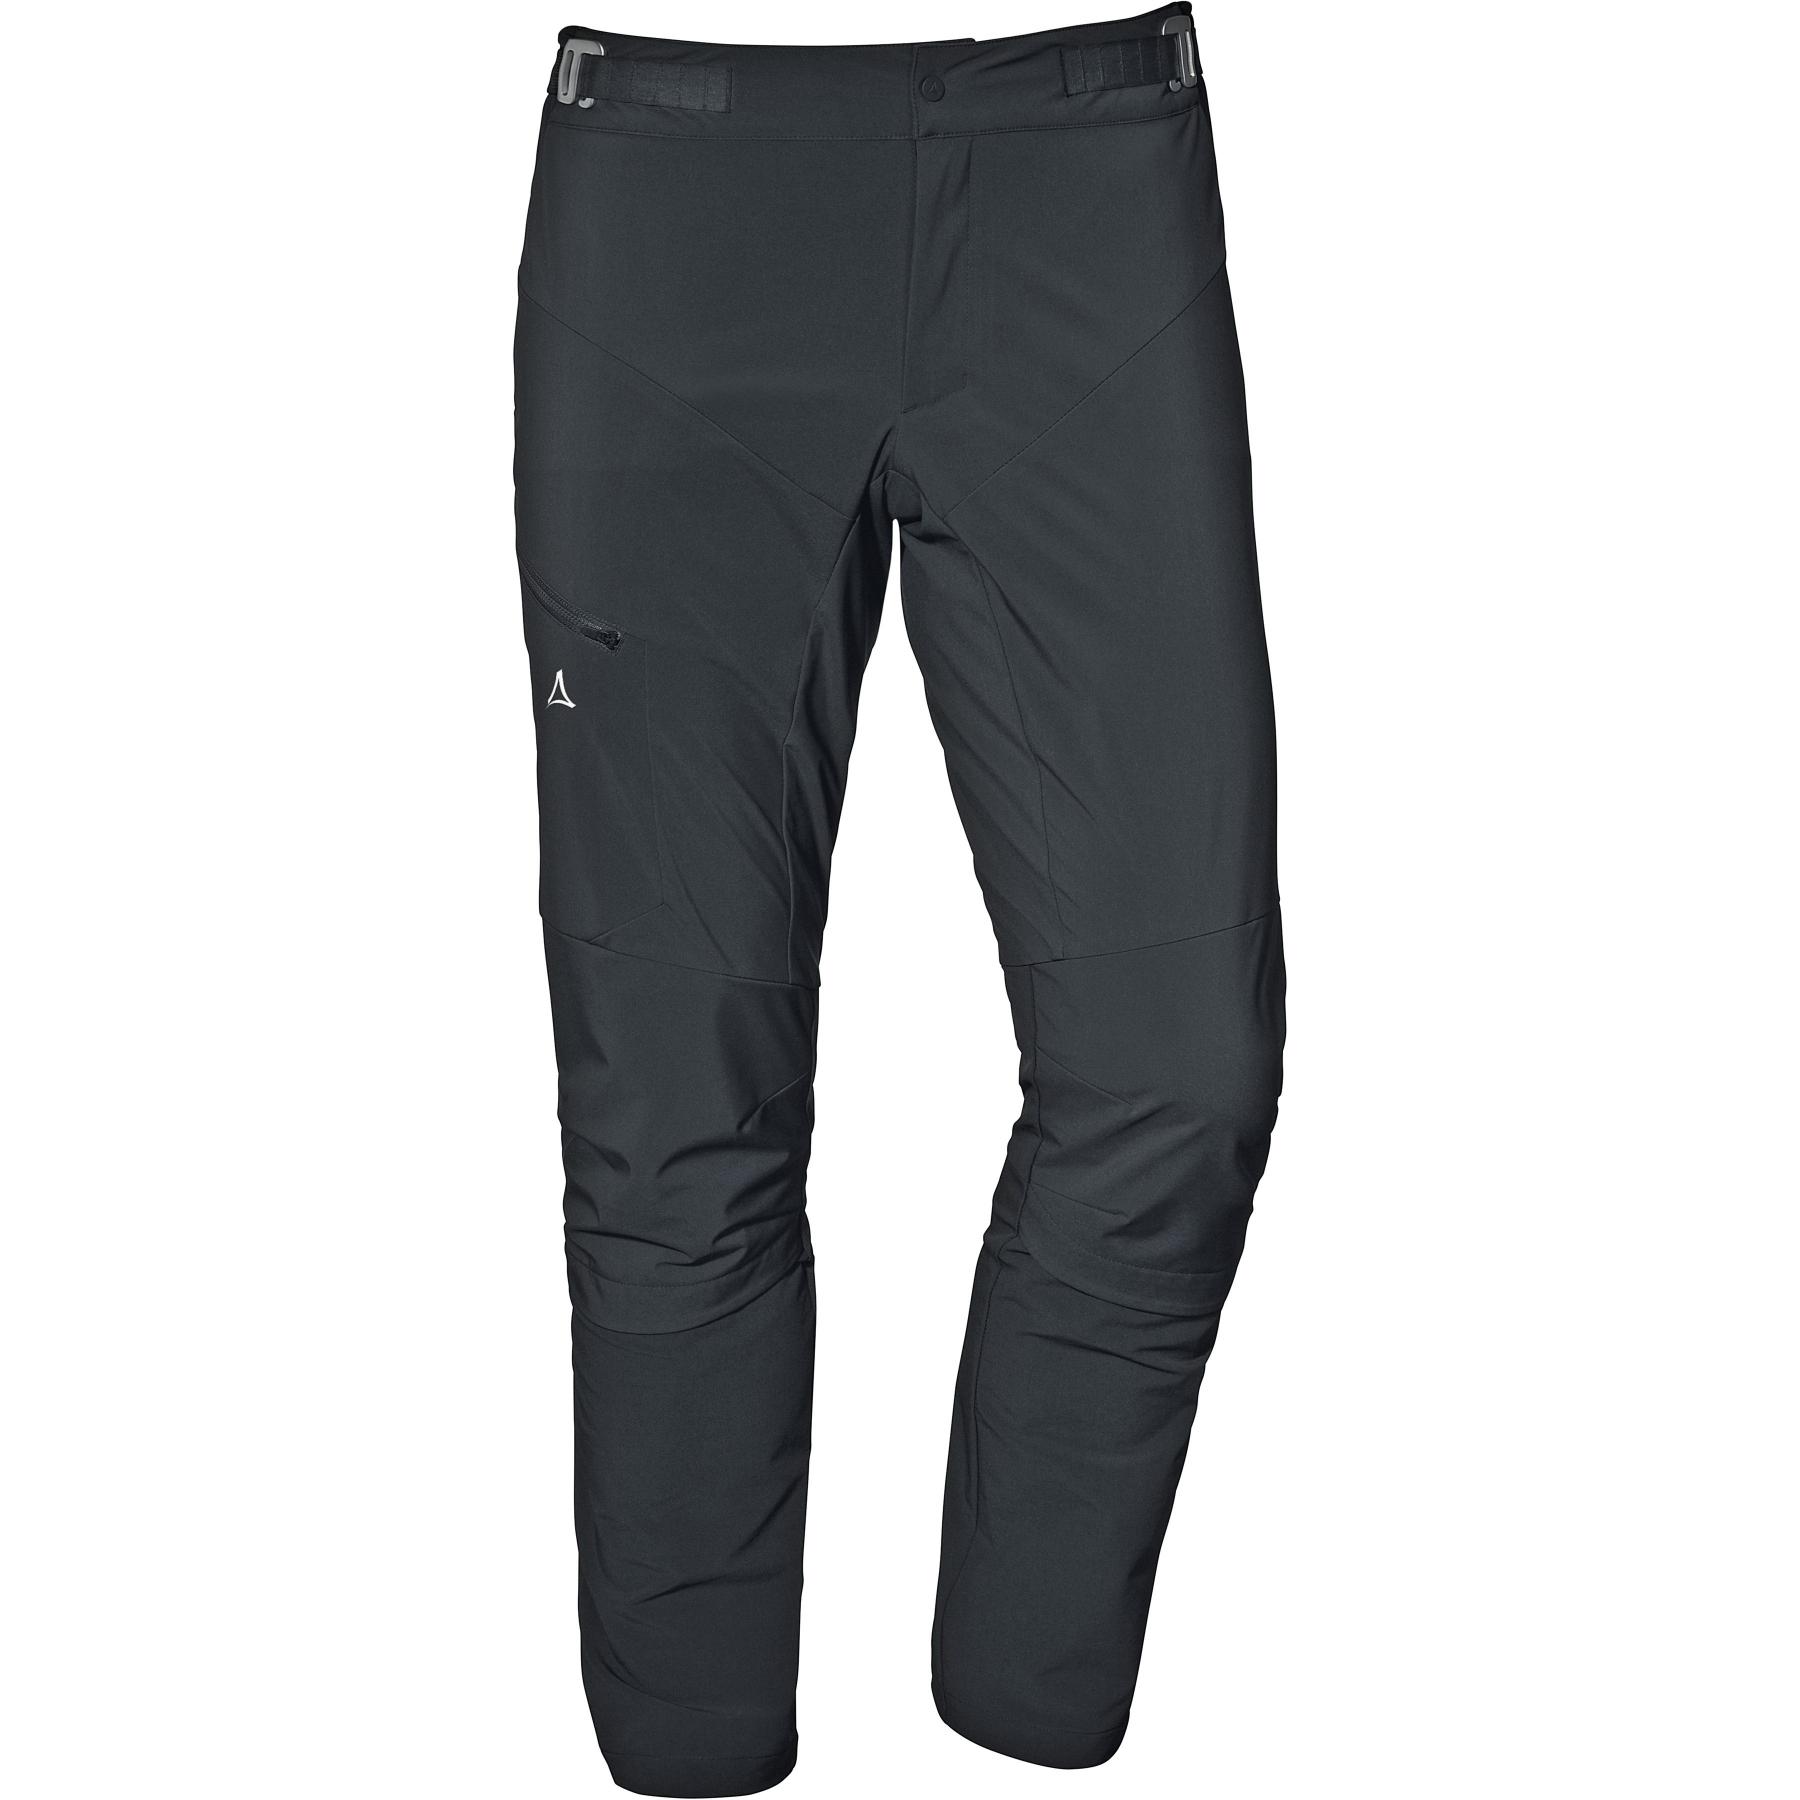 Schöffel Tree Run Hybrid Pants - black 9990